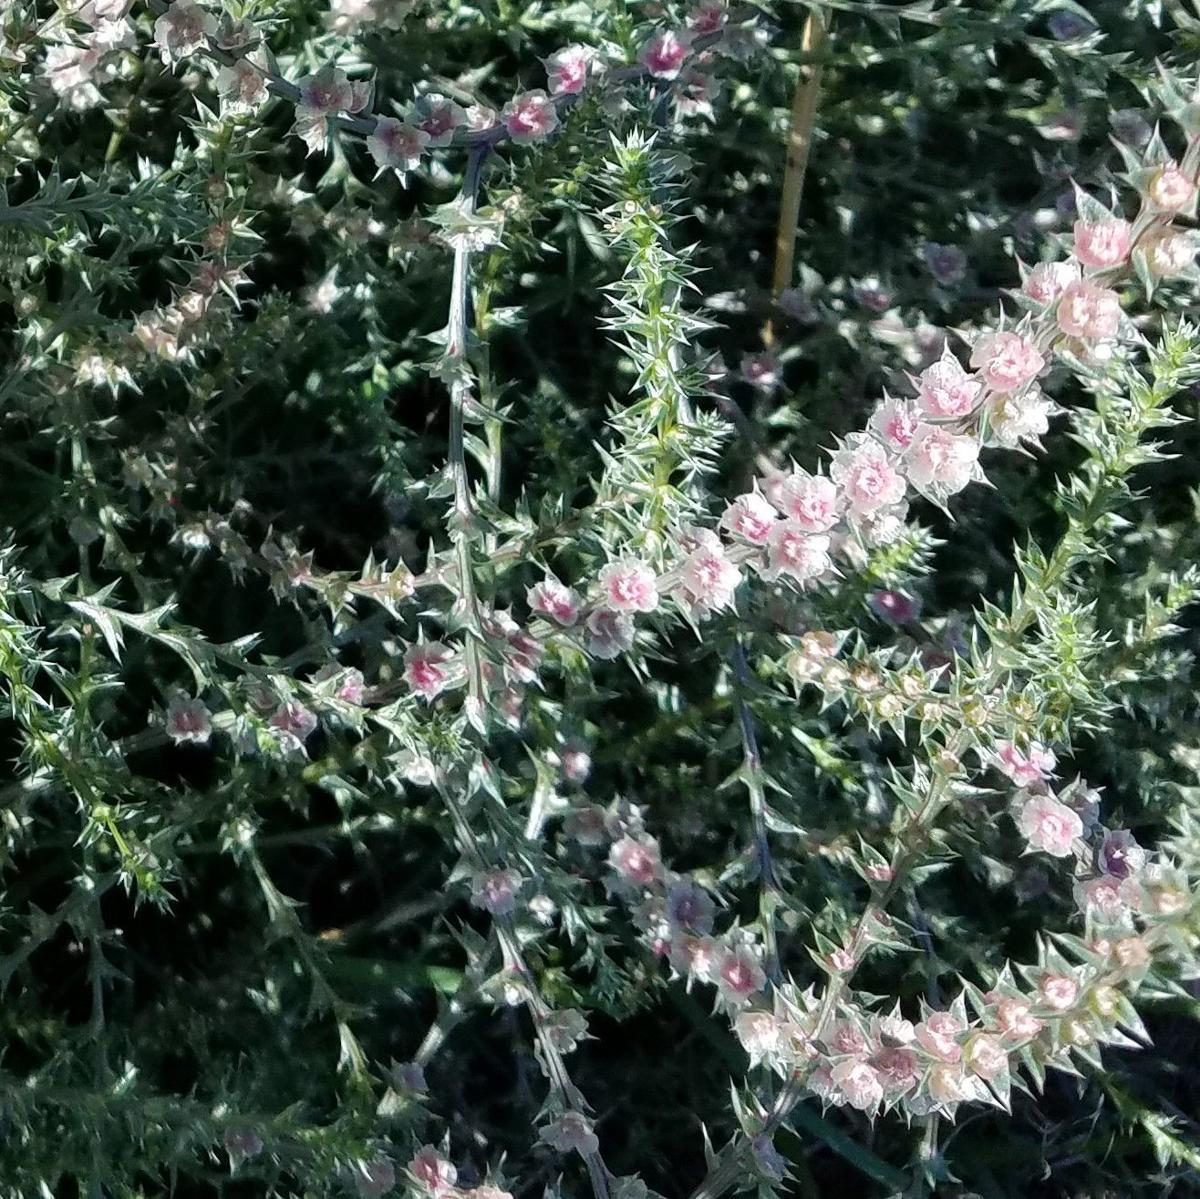 Russian thistle, tumbleweed